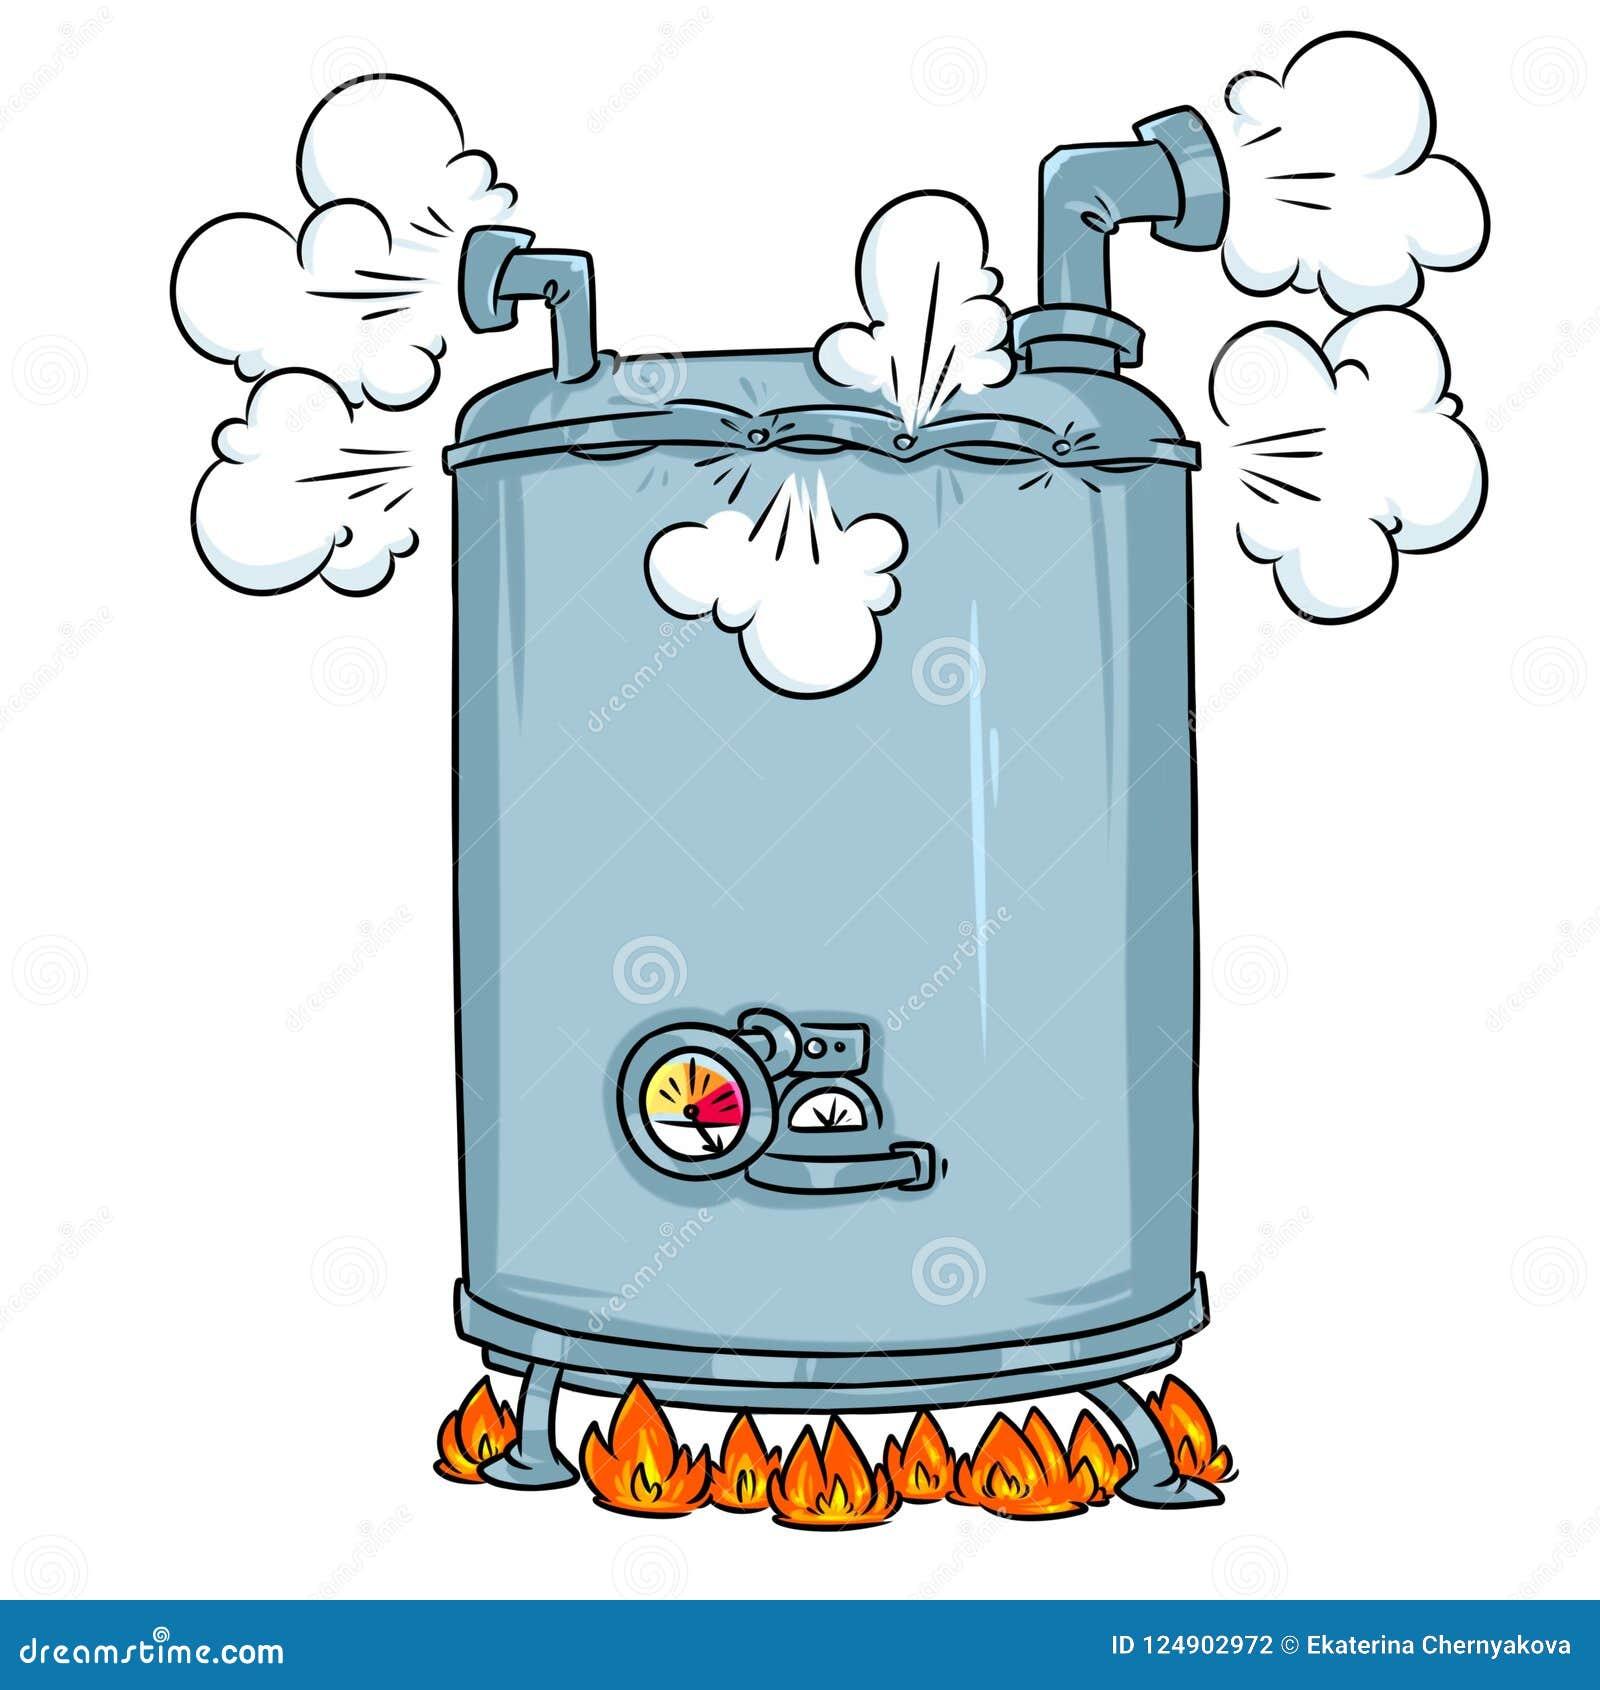 Boiling Steam Boiler Cartoon Illustration Stock Illustration ...